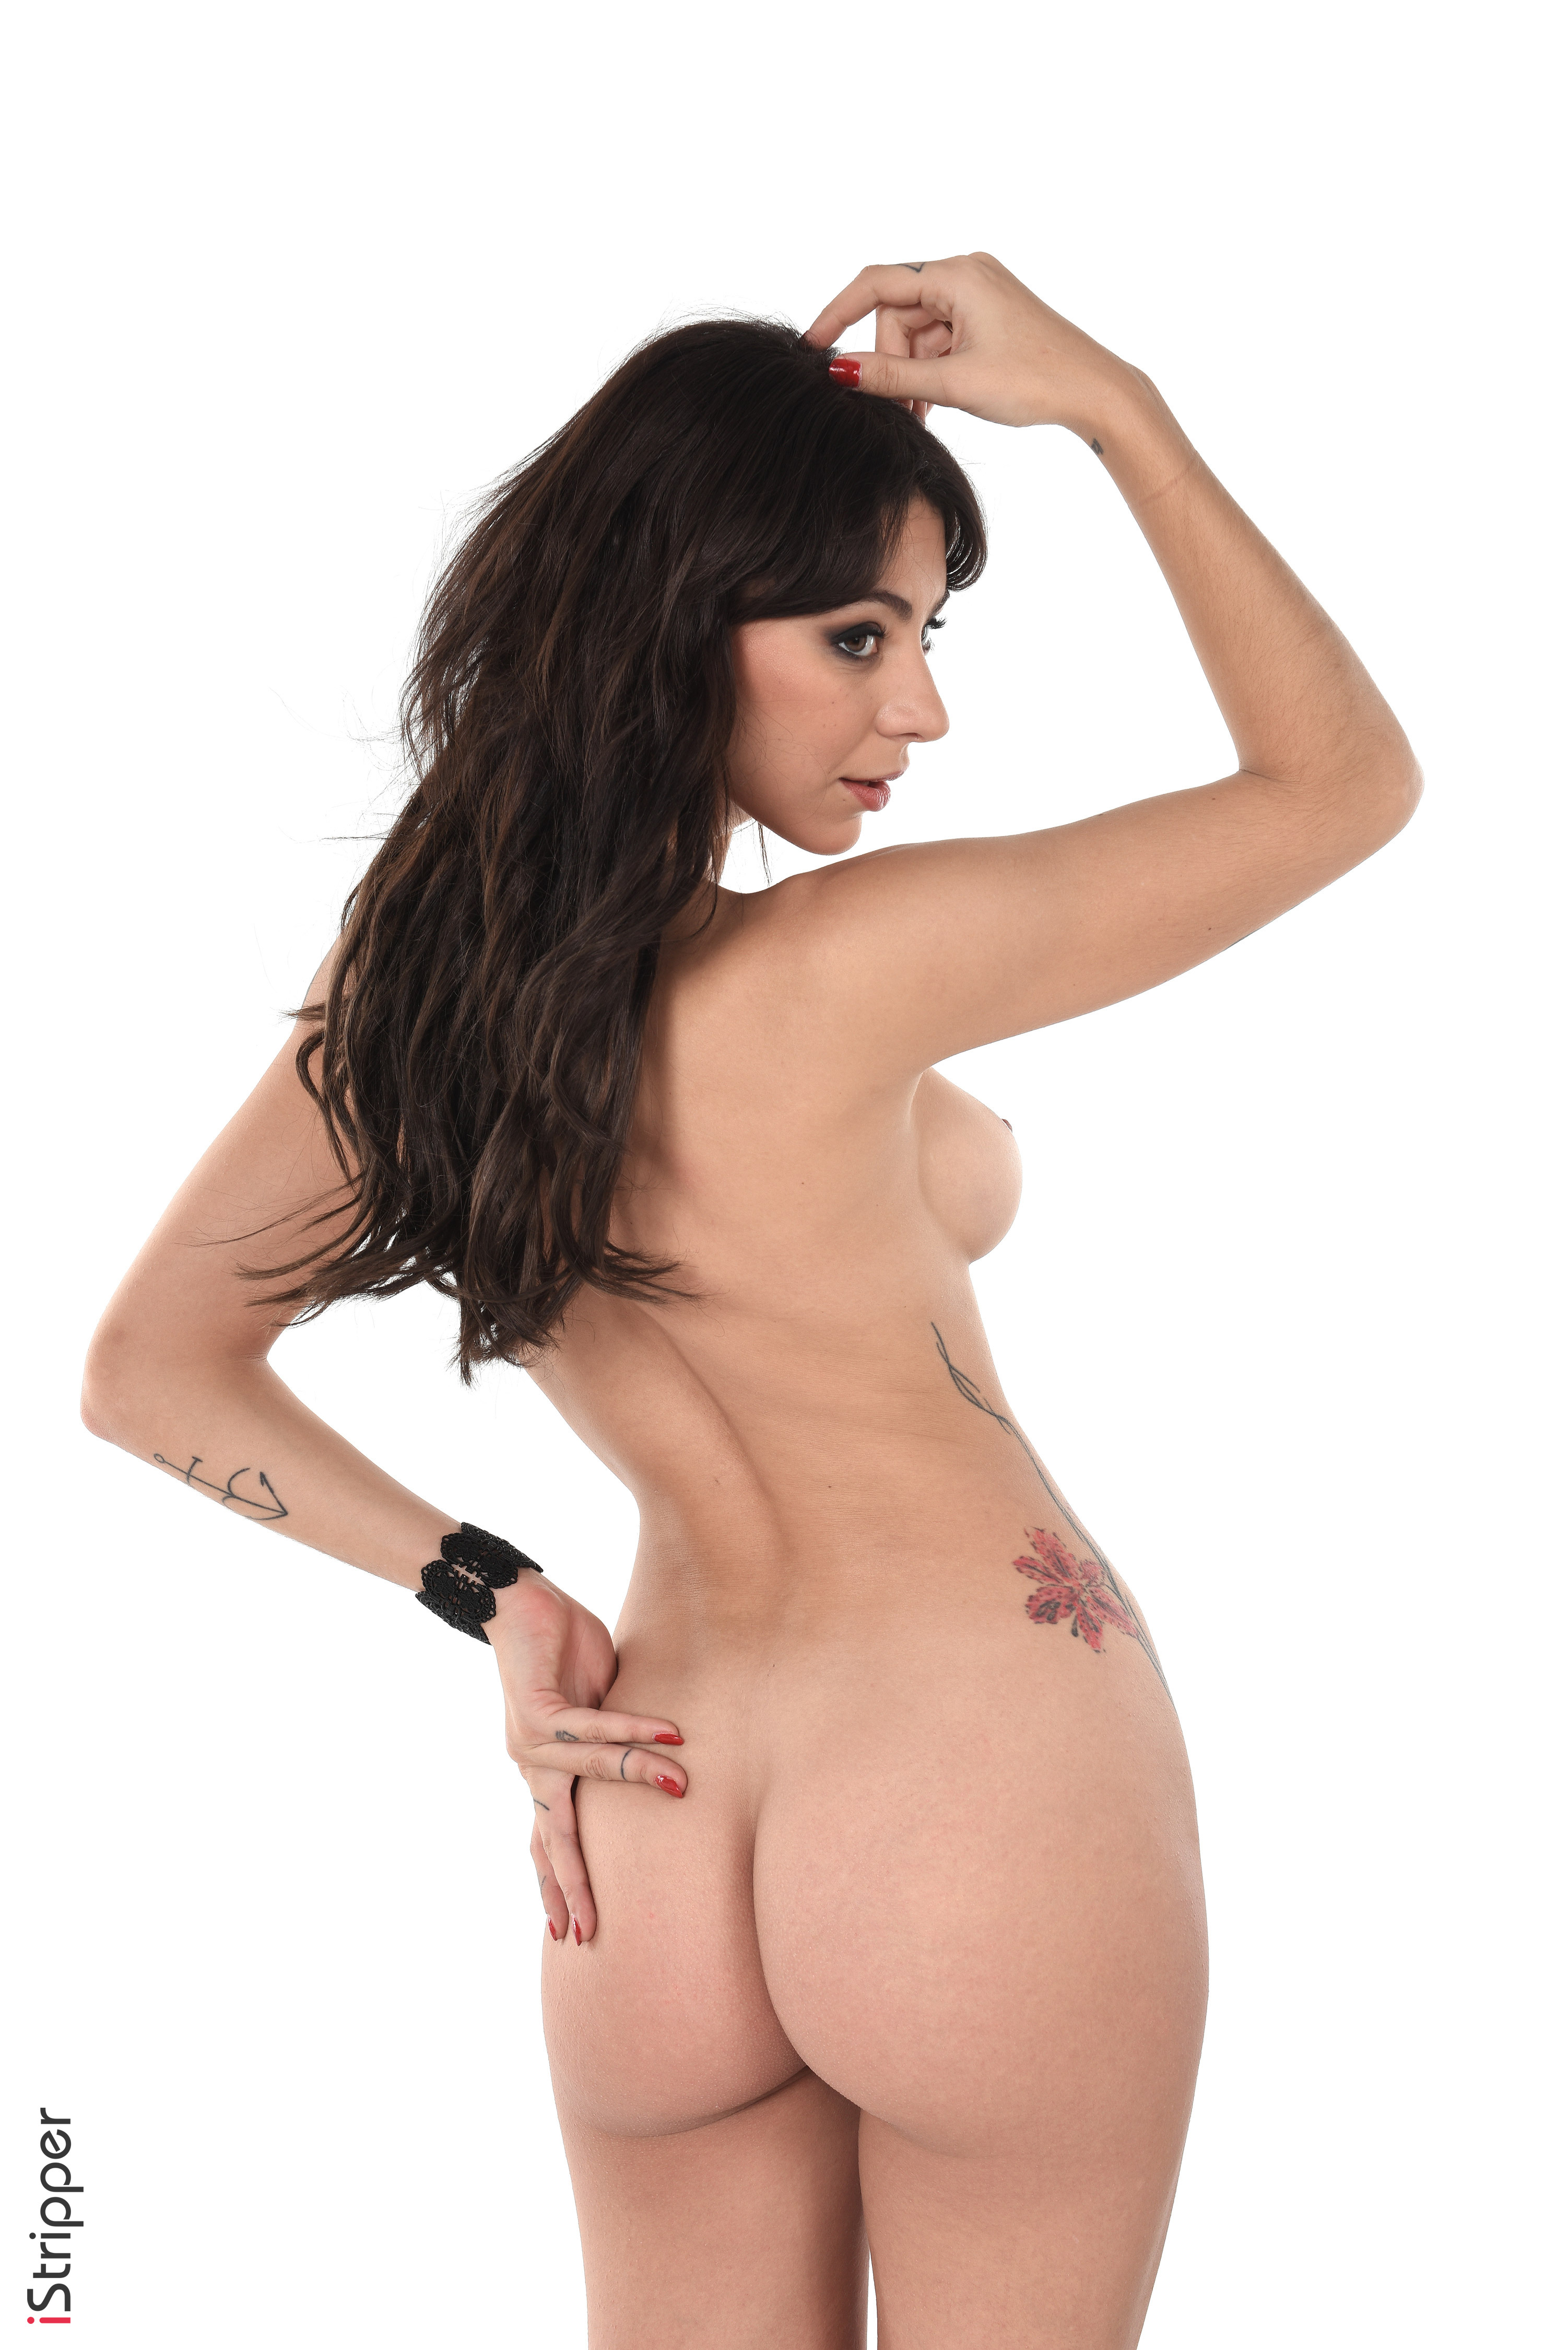 naked Huge tittied Huge boobed women Latin women boobed chicks backgrounds